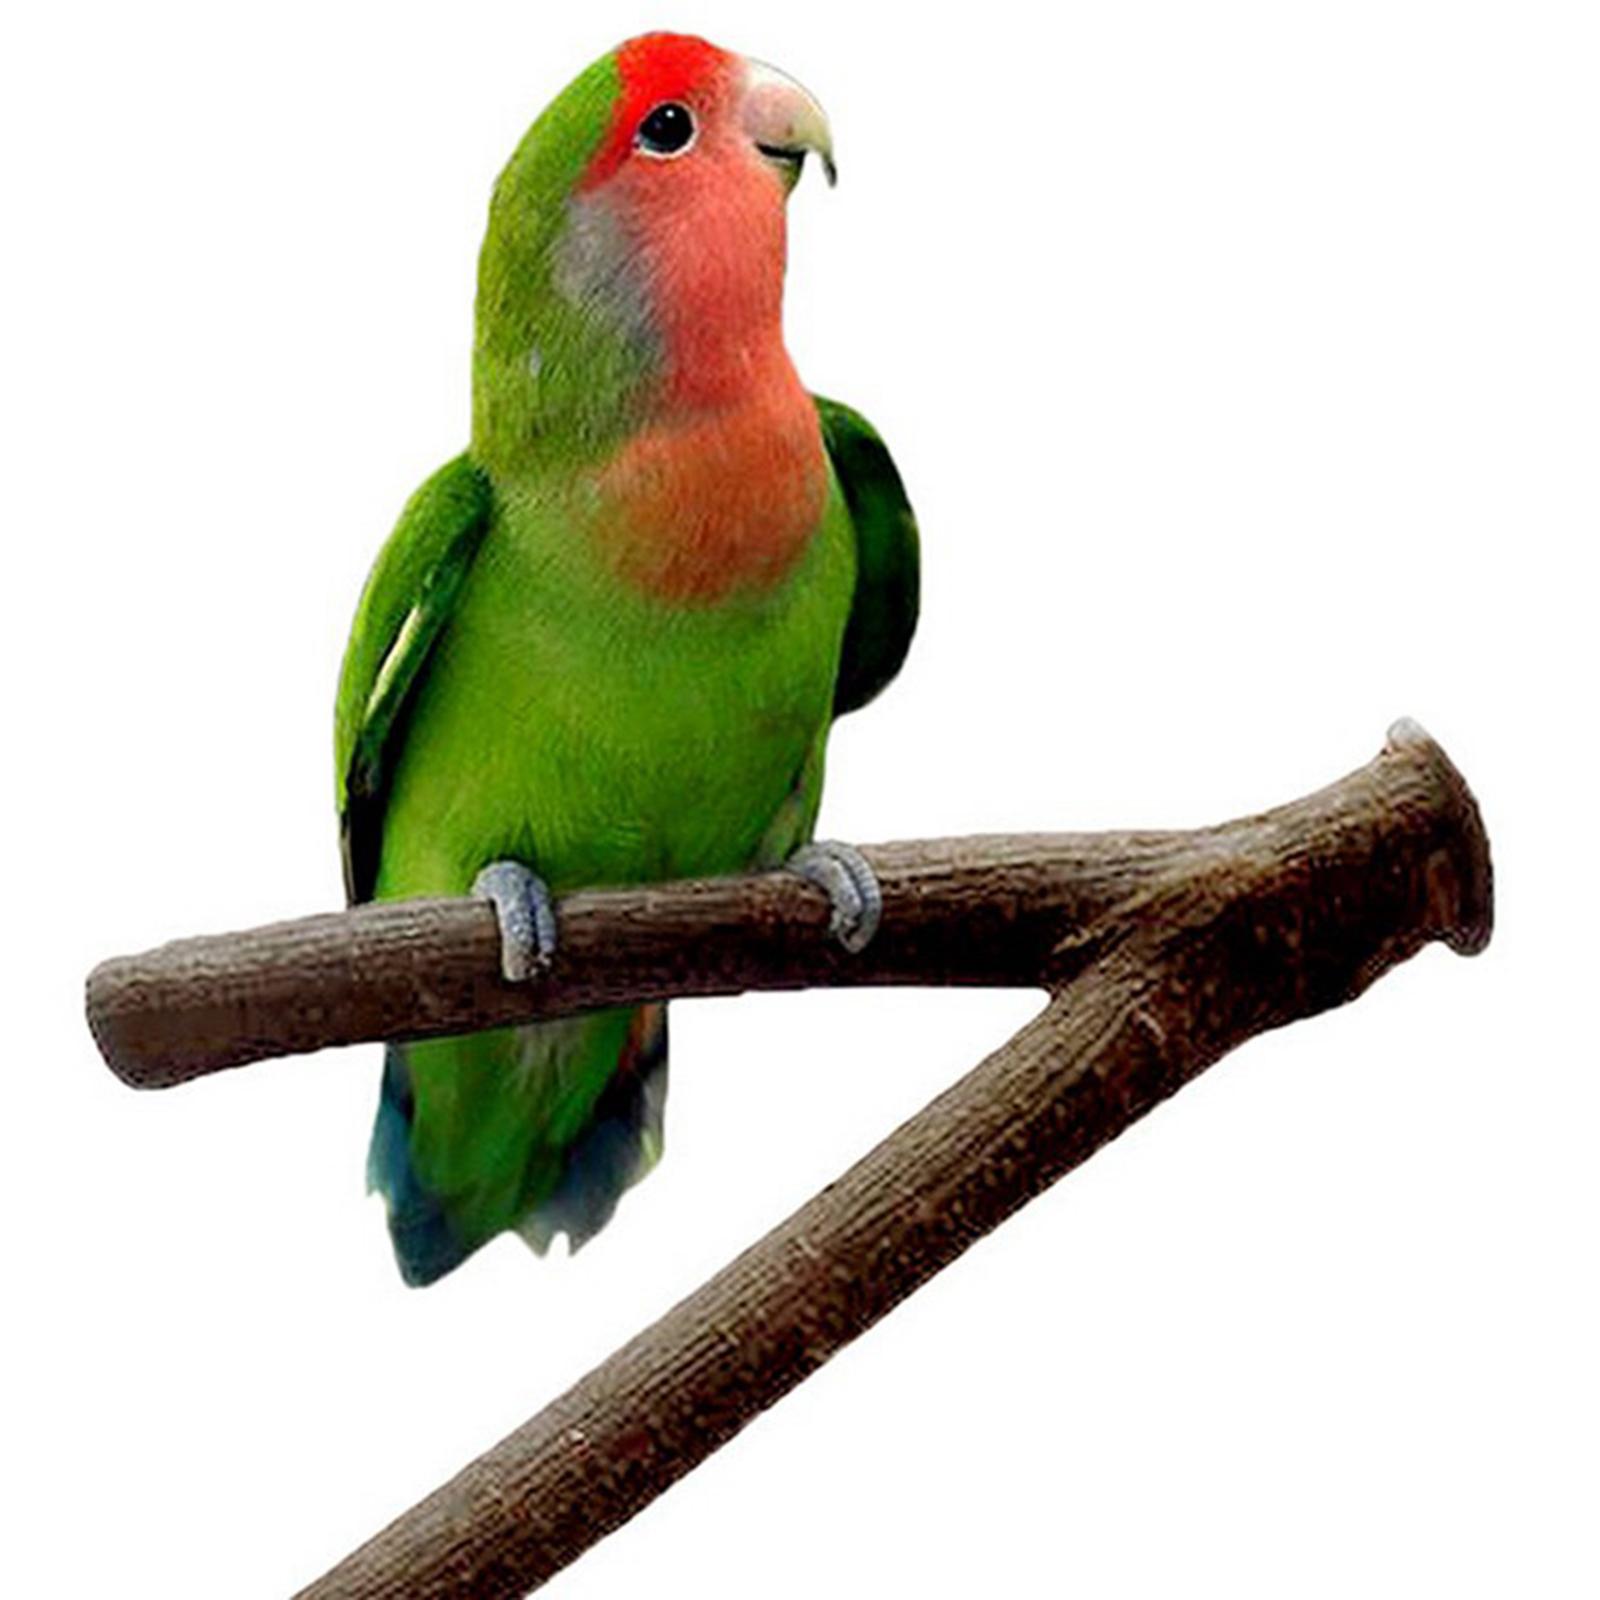 thumbnail 12 - Bird-Perch-Wood-Stand-Bird-Cage-Swing-Branch-for-Parrot-Parakeet-Cockatiel